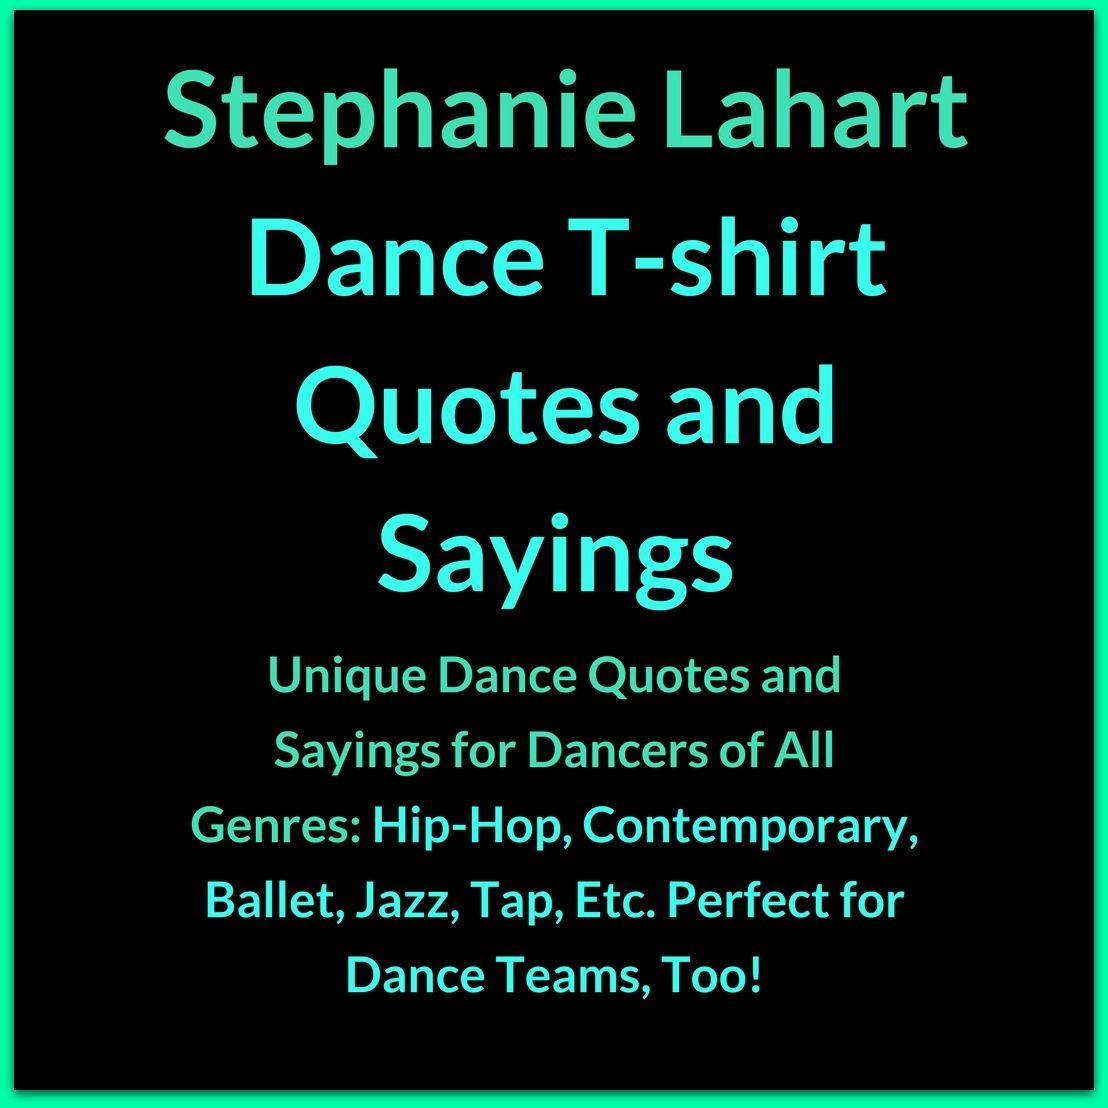 ed7c5abe7 Stephanie Lahart Dance T-shirt Quotes and Sayings. Unique Dance Quotes and  Sayings for